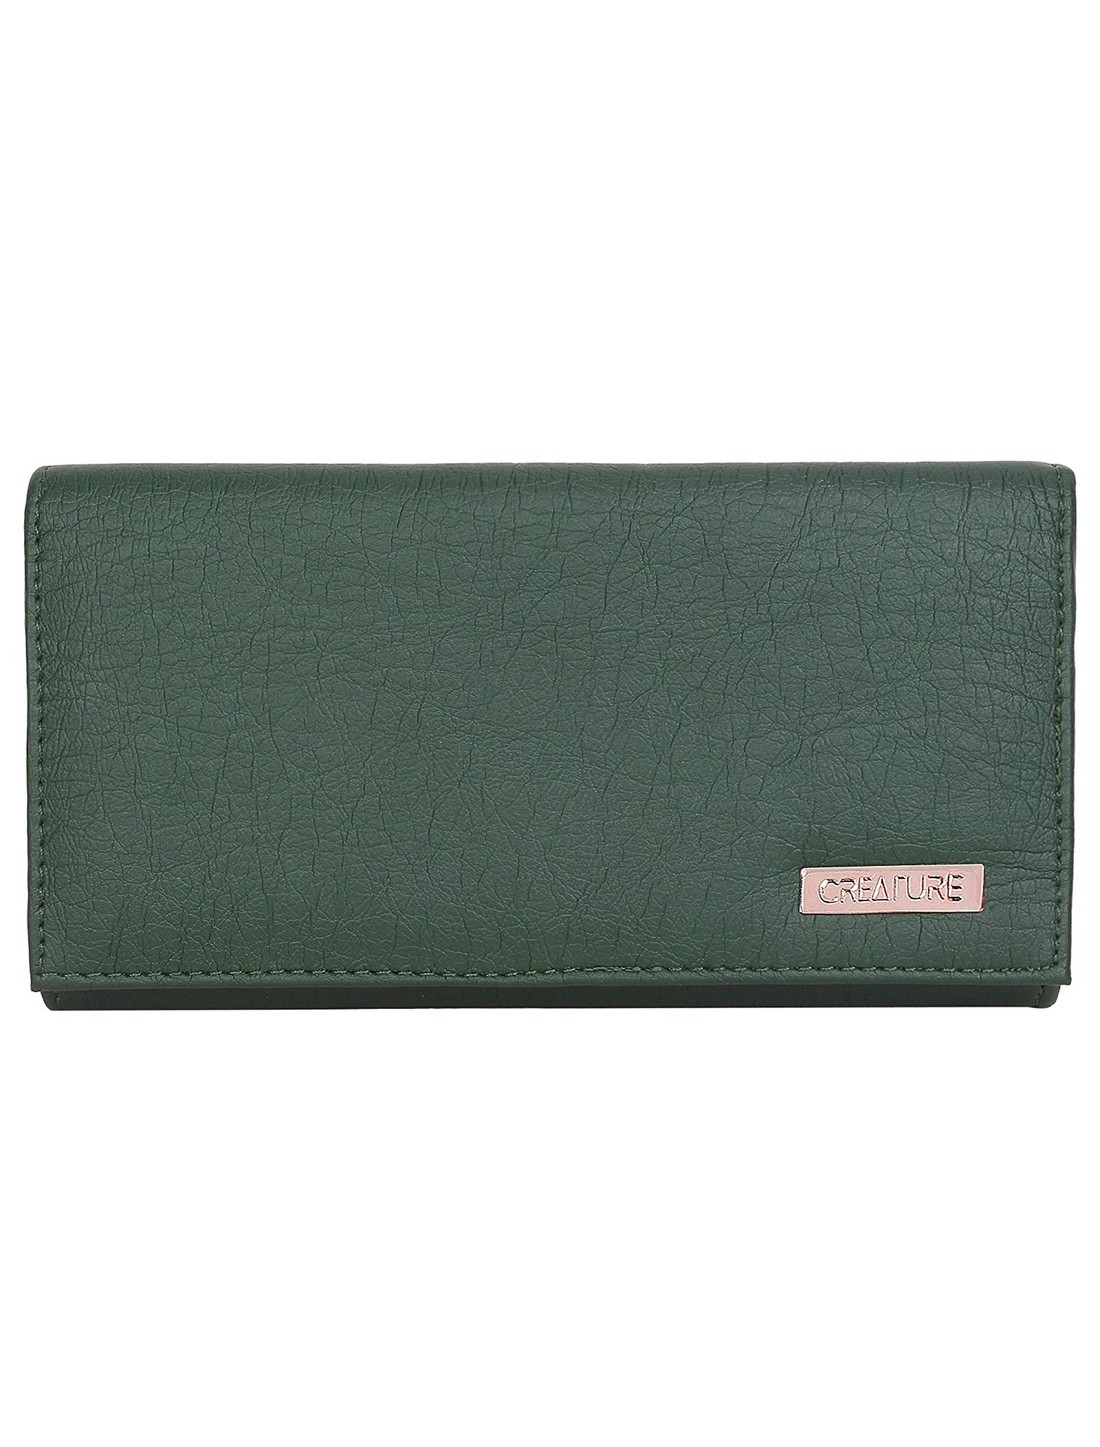 CREATURE   CREATURE Green Stylish PU Clutch for Women